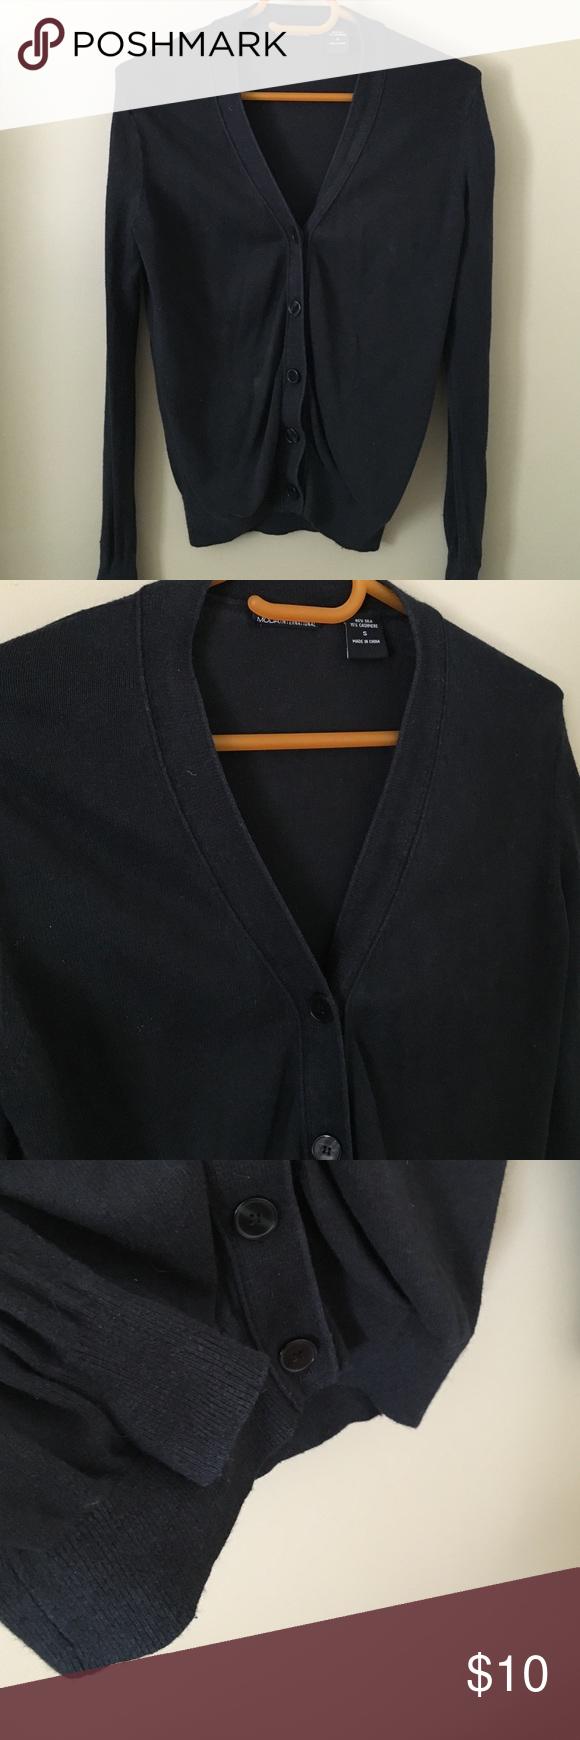 Silk/Cashmere Cardigan Sweater Silk and cashmere black cardigan ...